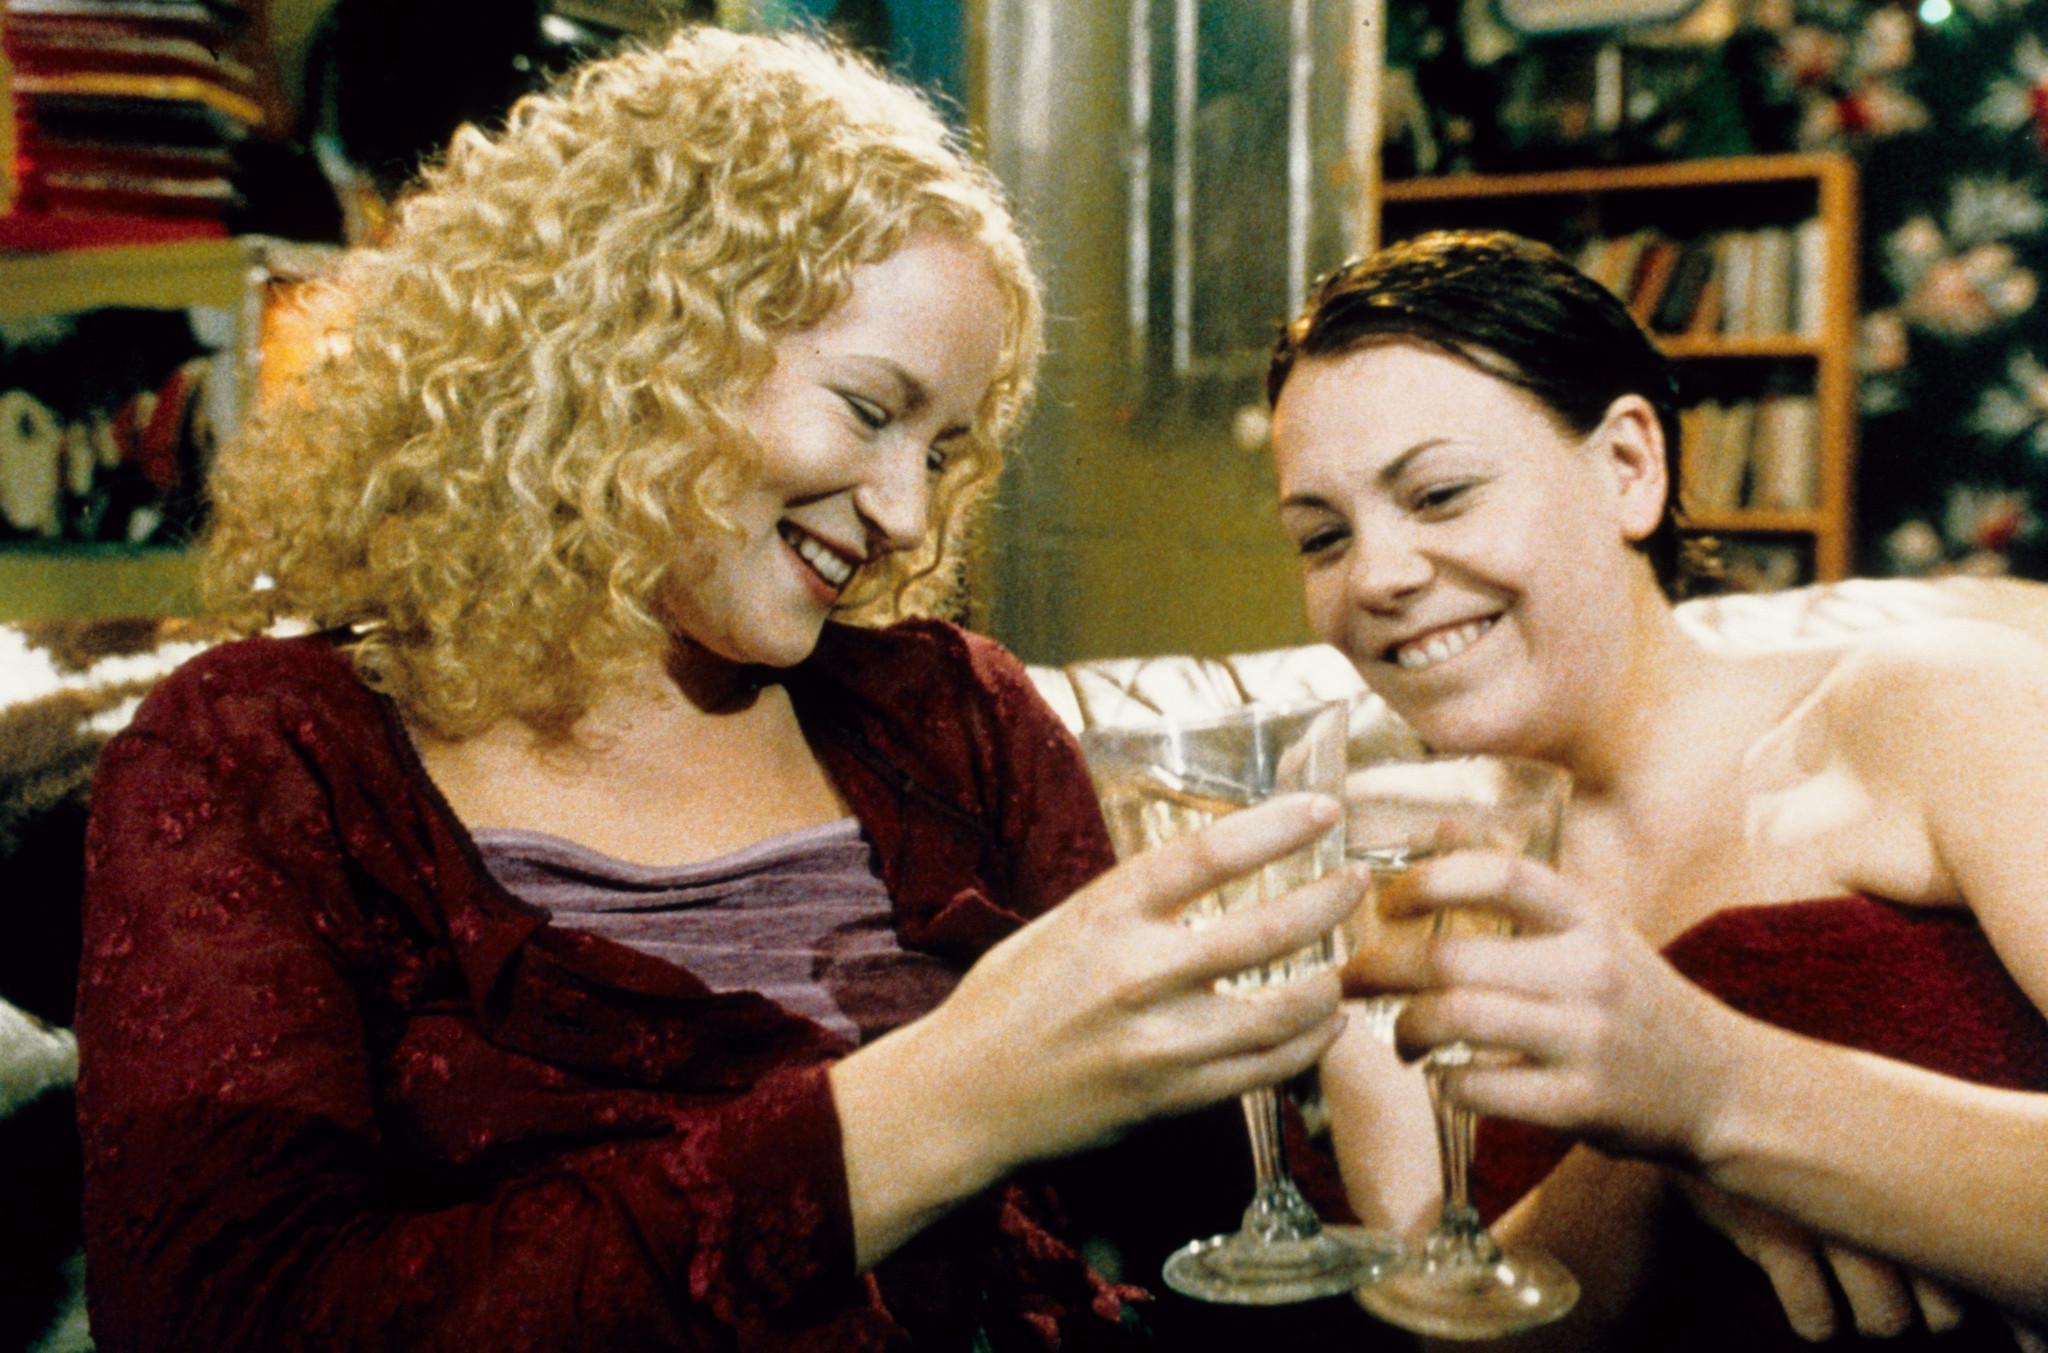 Lorraine Pilkington and Nicola Reynolds in Human Traffic (1999)